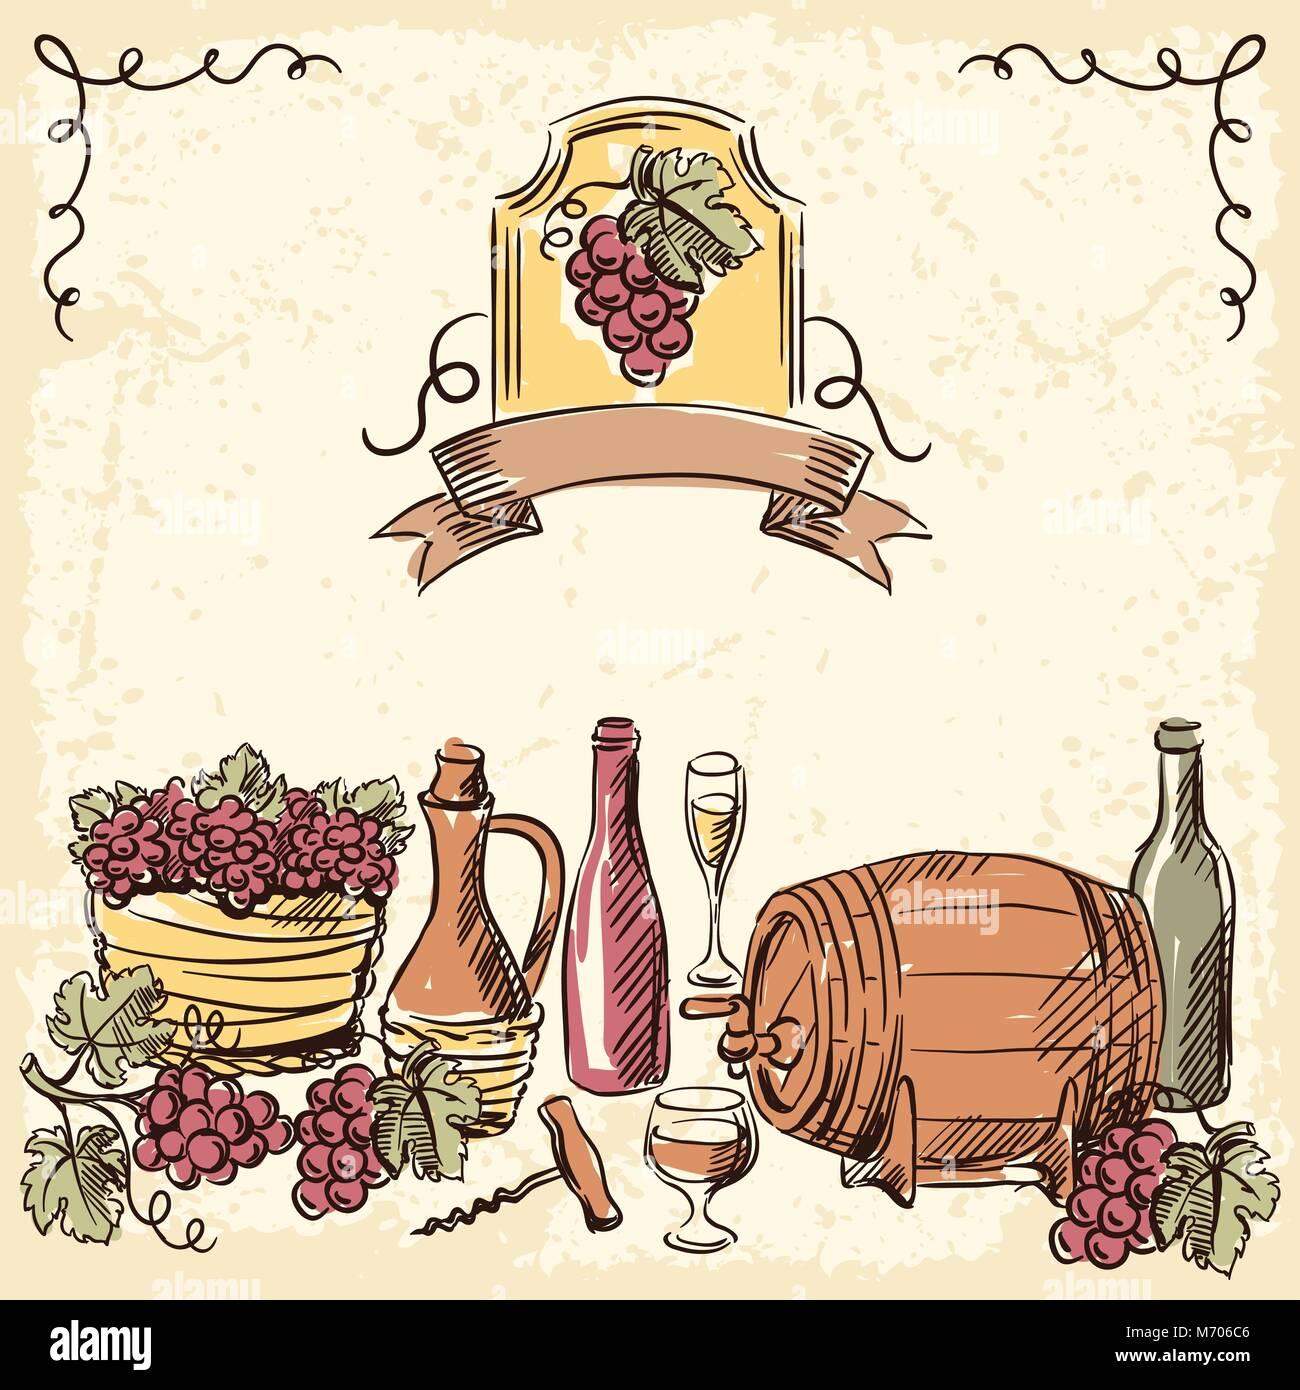 Wine vintage hand drawn illustration Stock Vector